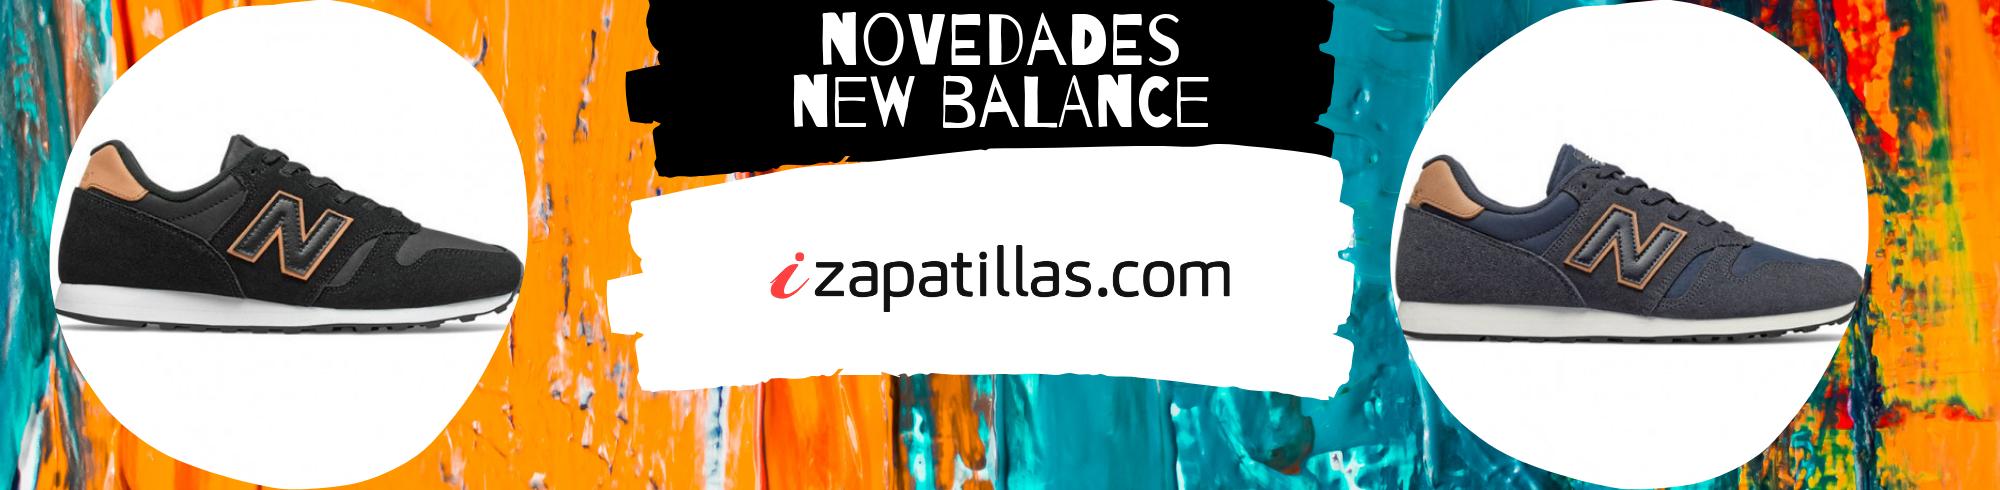 Novedades New Balance Hombre